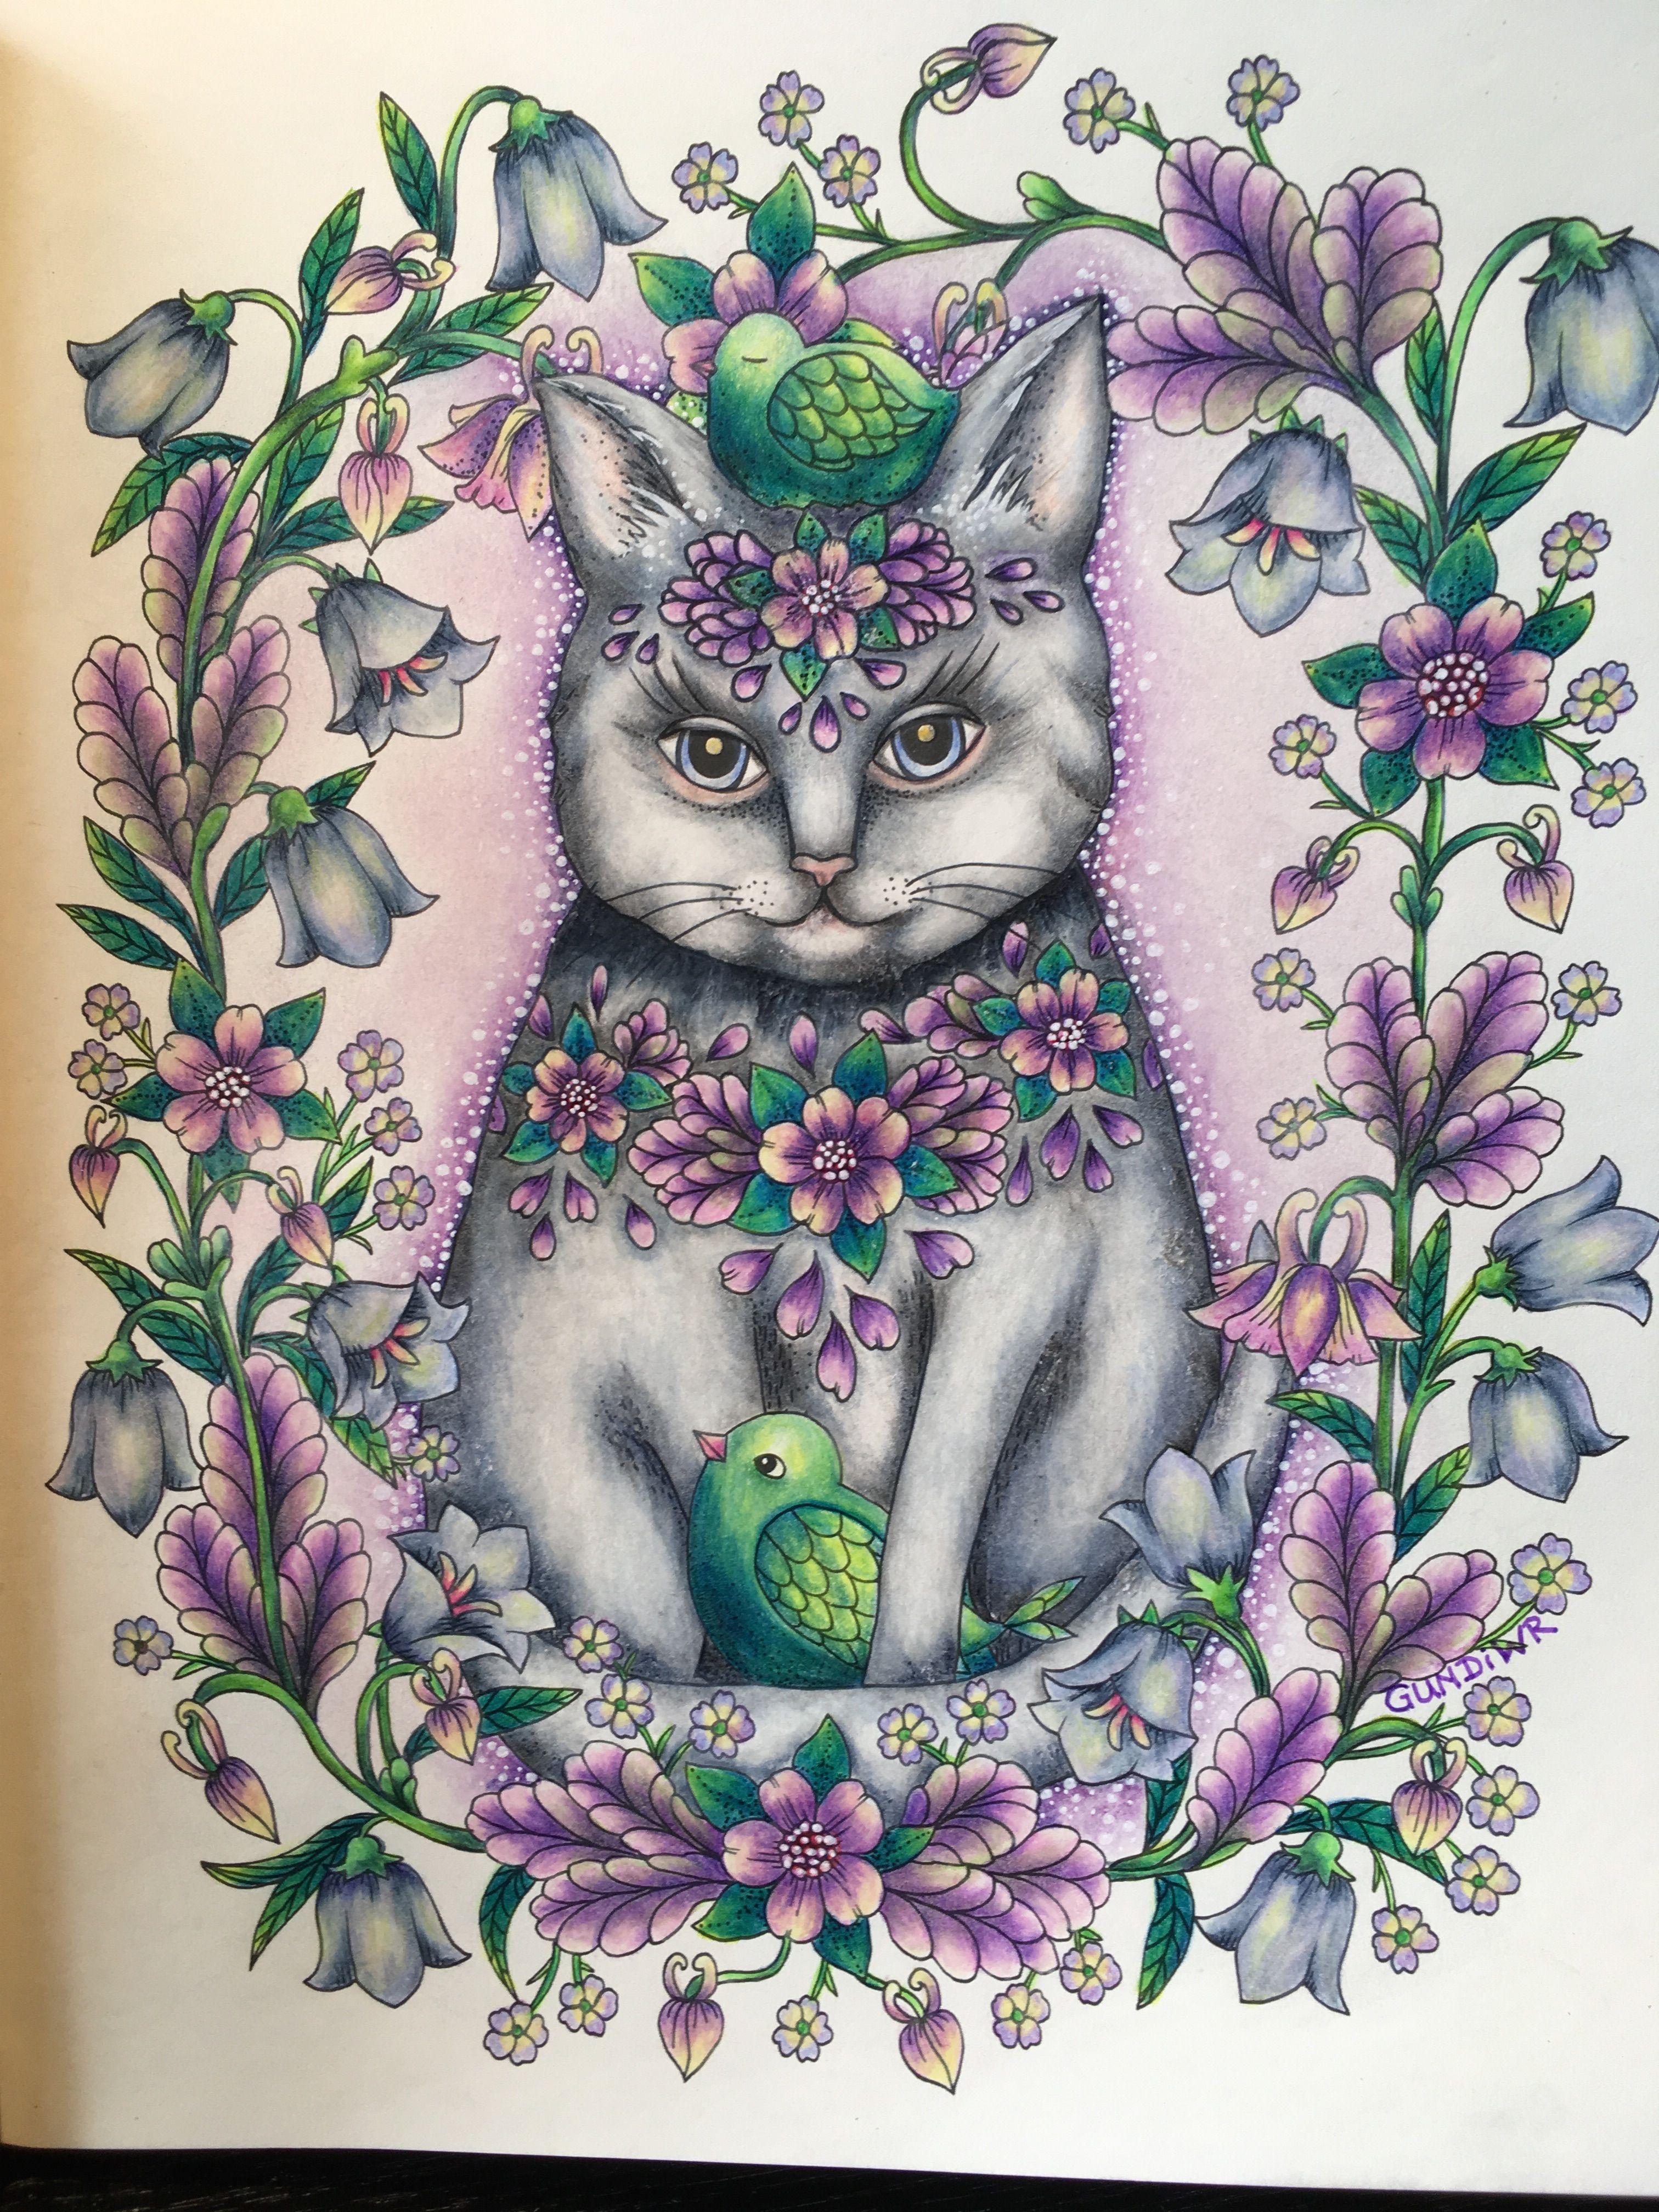 The Flower Cat Maria Trolle Twilight Garden Wonderful FlowersThe FlowersColoring BooksAdult